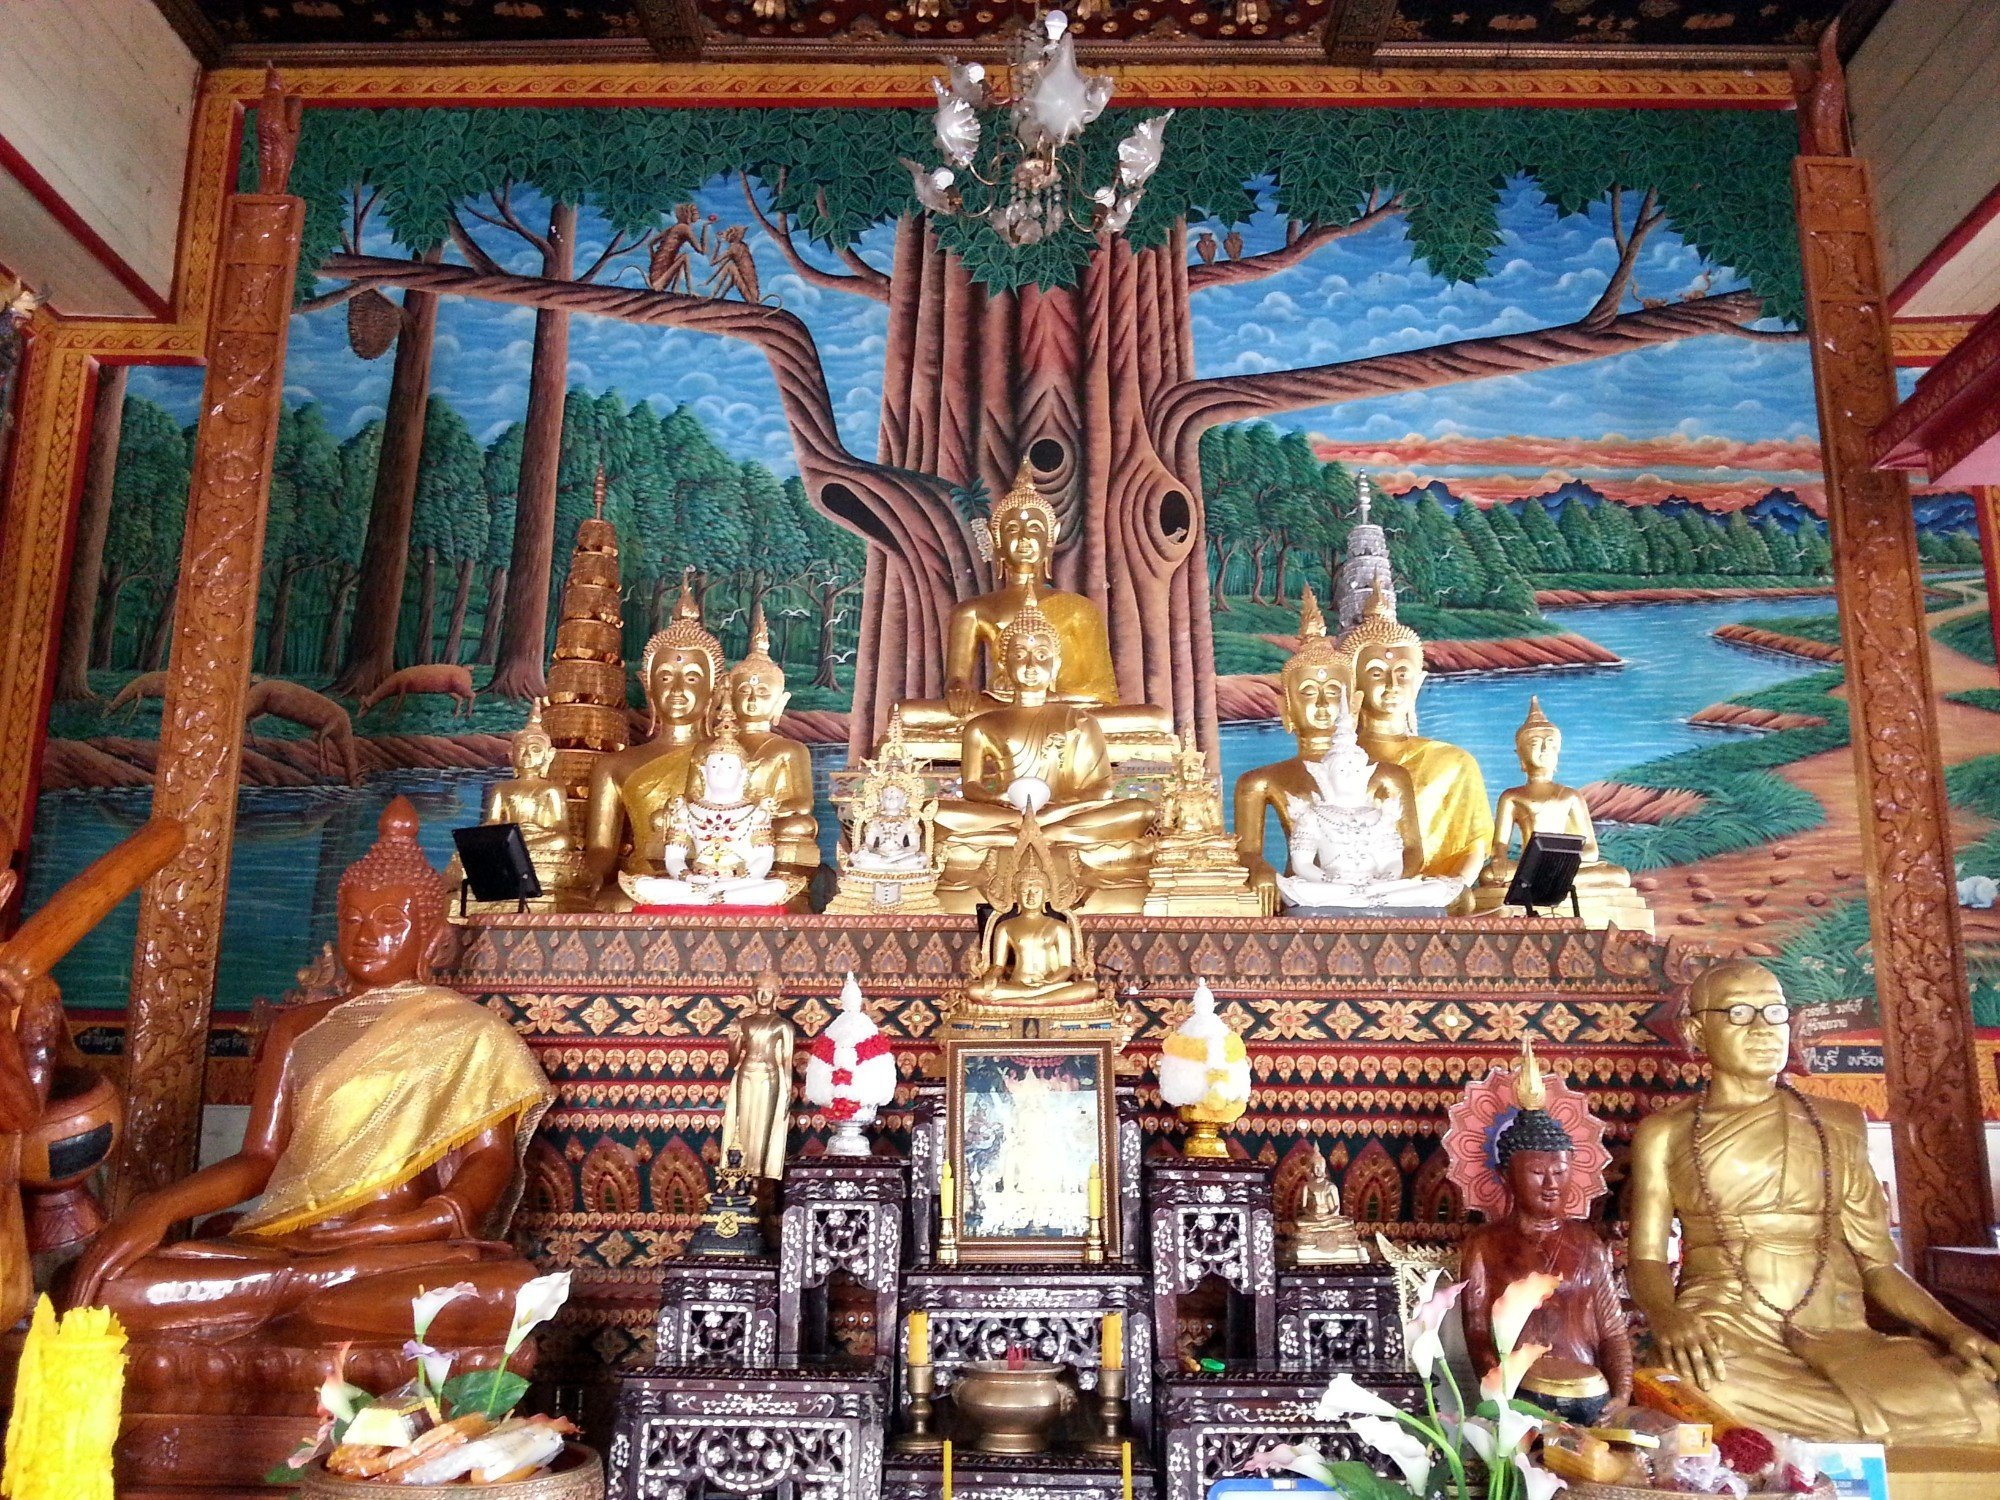 500 year old Buddha statue at Wat Phong Sunan